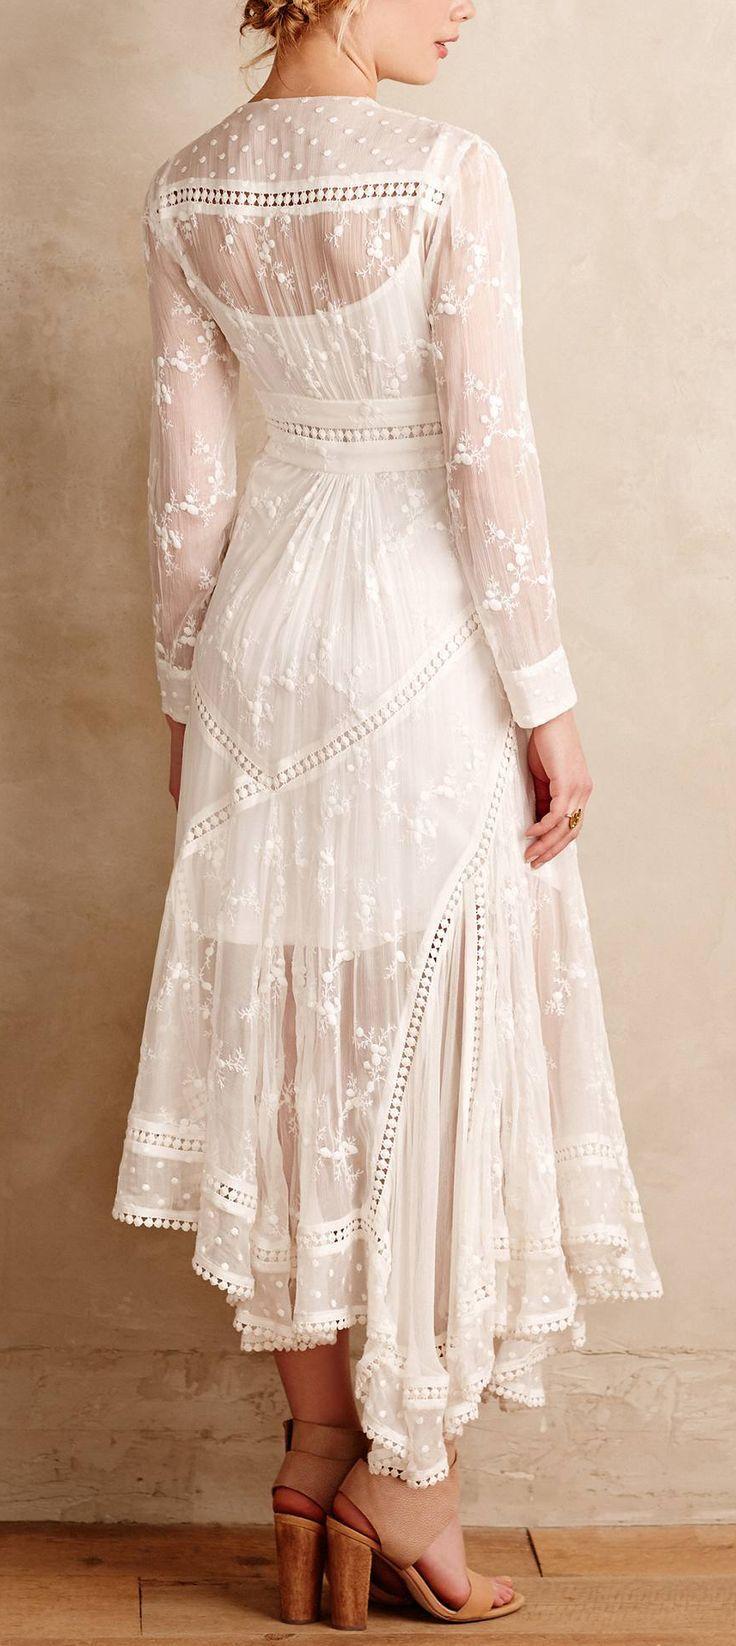 Silk embroidered dress bohemian boho style hippy hippie chic bohme vibe gypsy fashion indie